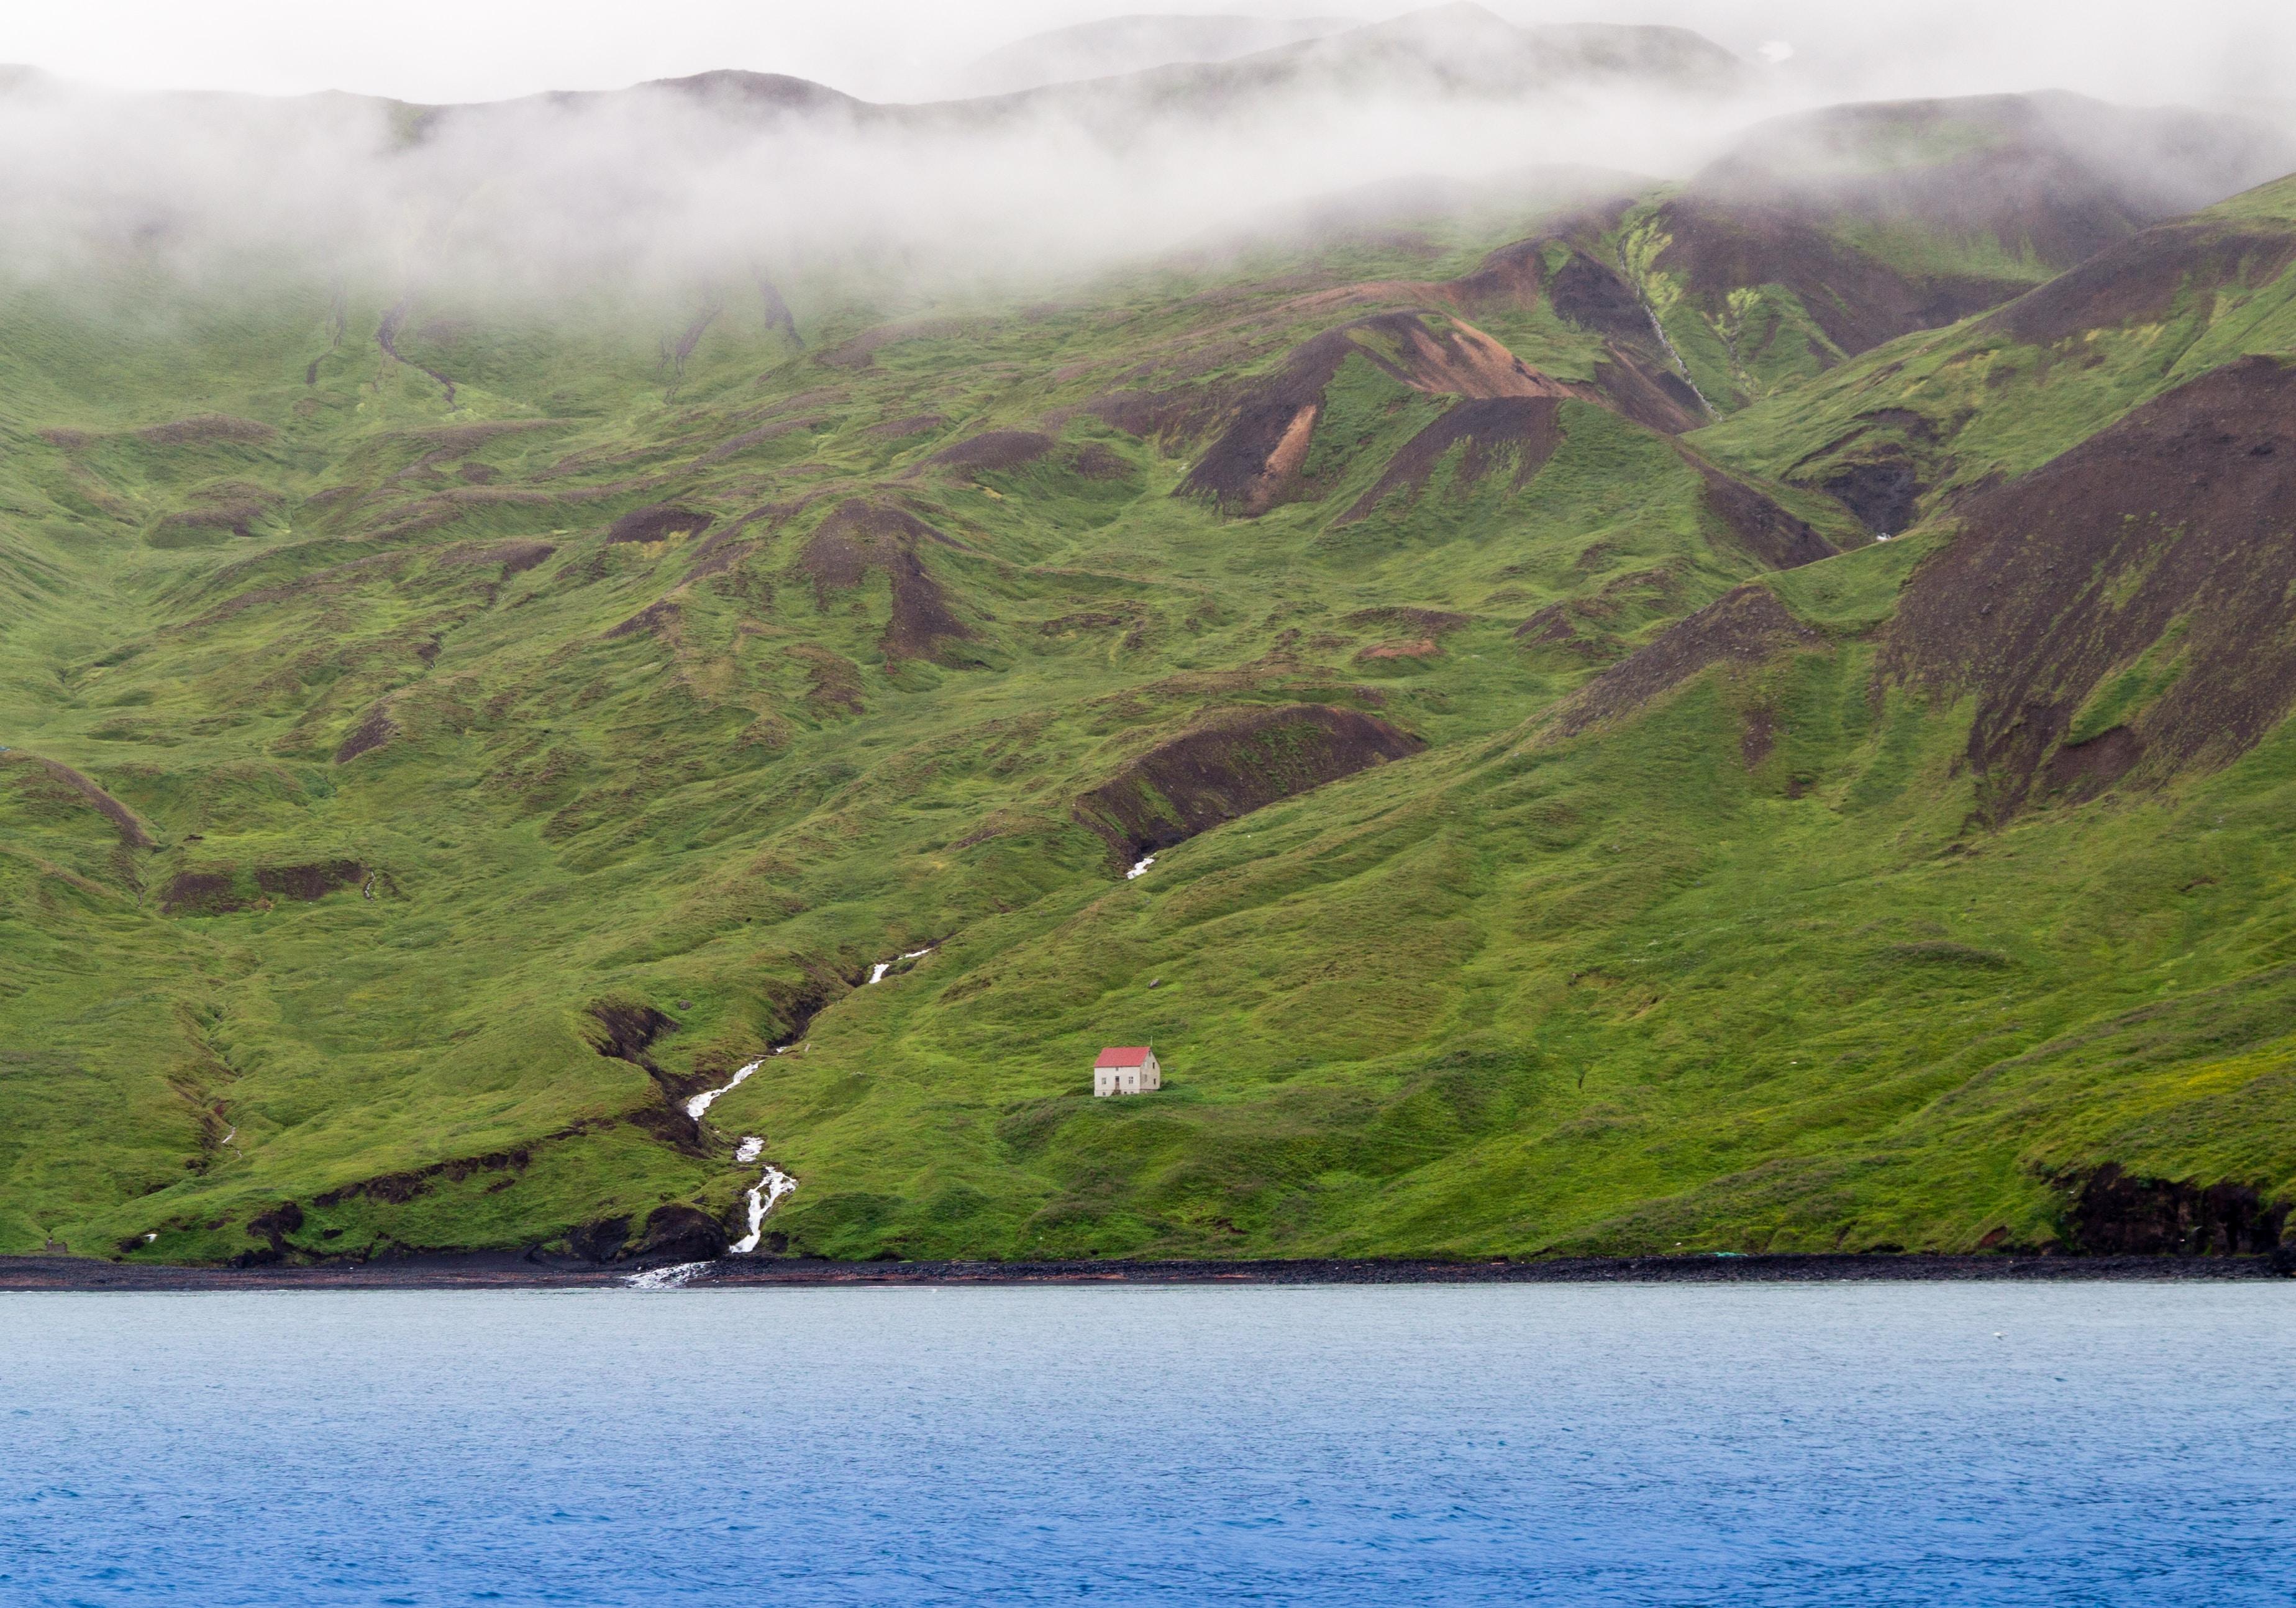 house on mountain slope